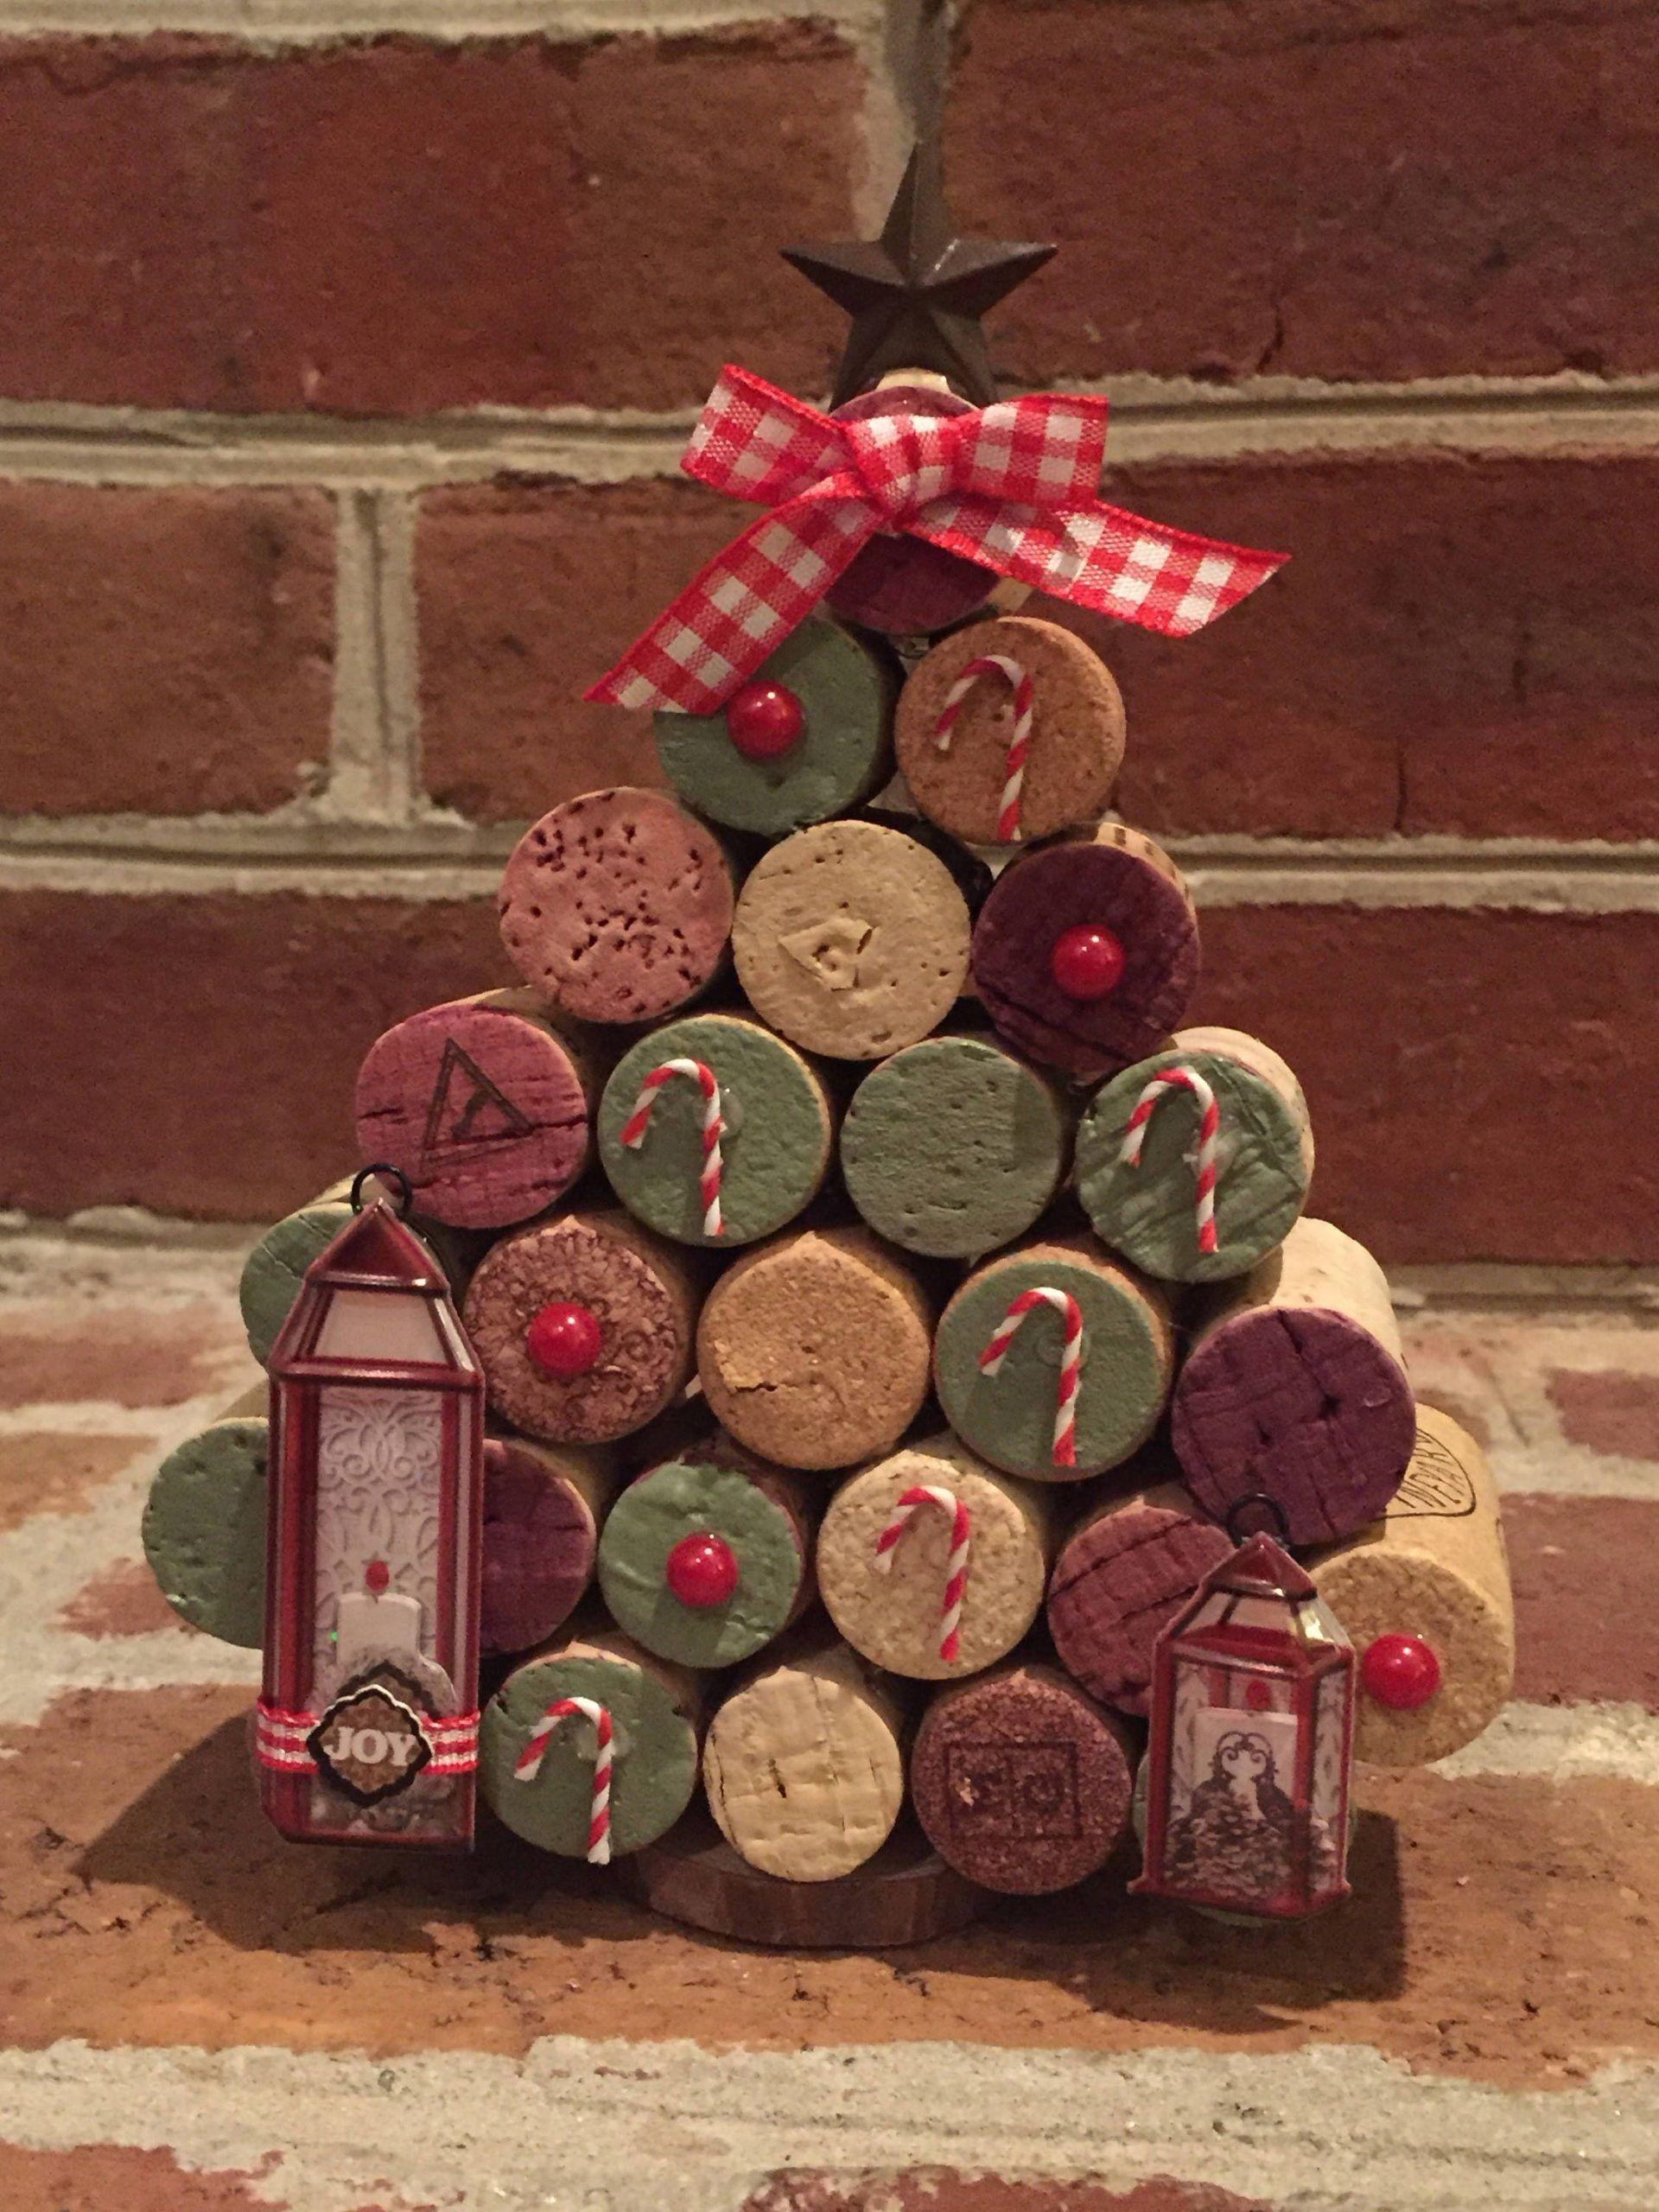 Wine Cork Small Christmas Tree Christmas Cork Small Tree Wine In 2020 Wine Cork Christmas Tree Cork Christmas Trees Wine Cork Crafts Christmas